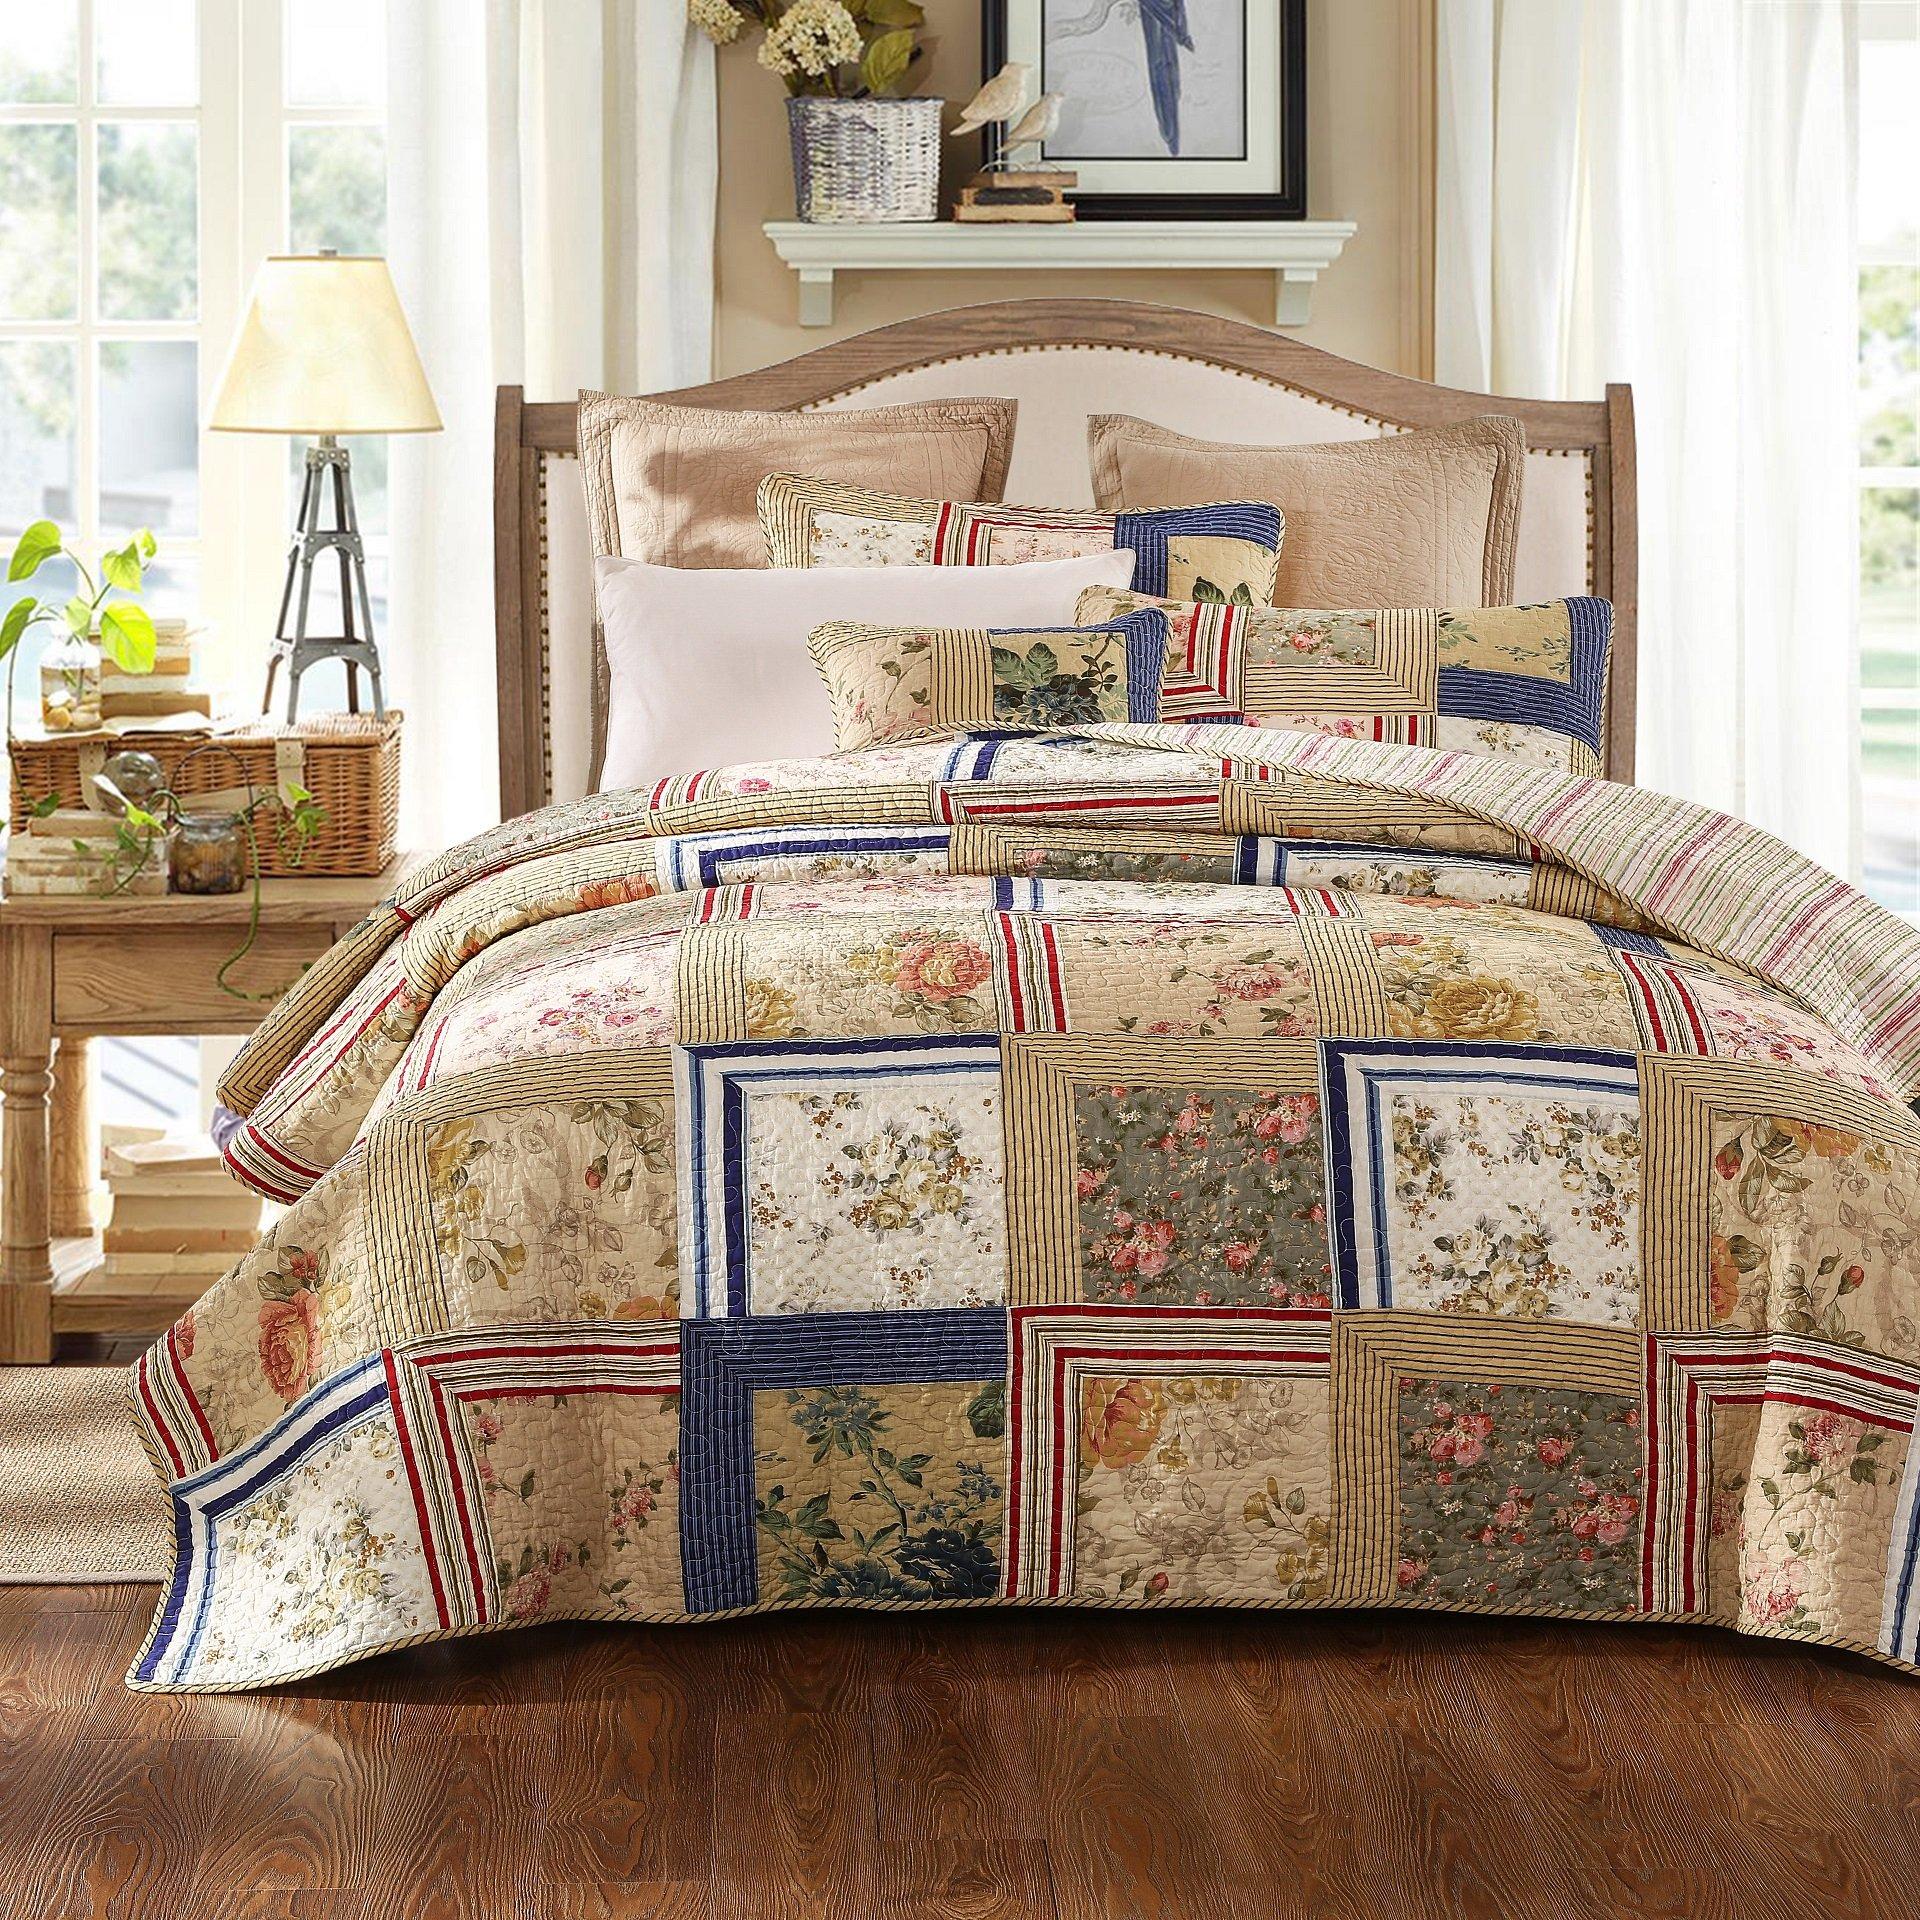 Tache 5 PC Exotic Cotton Japanese Emperor\'s Garden Bedspread Quilt ...